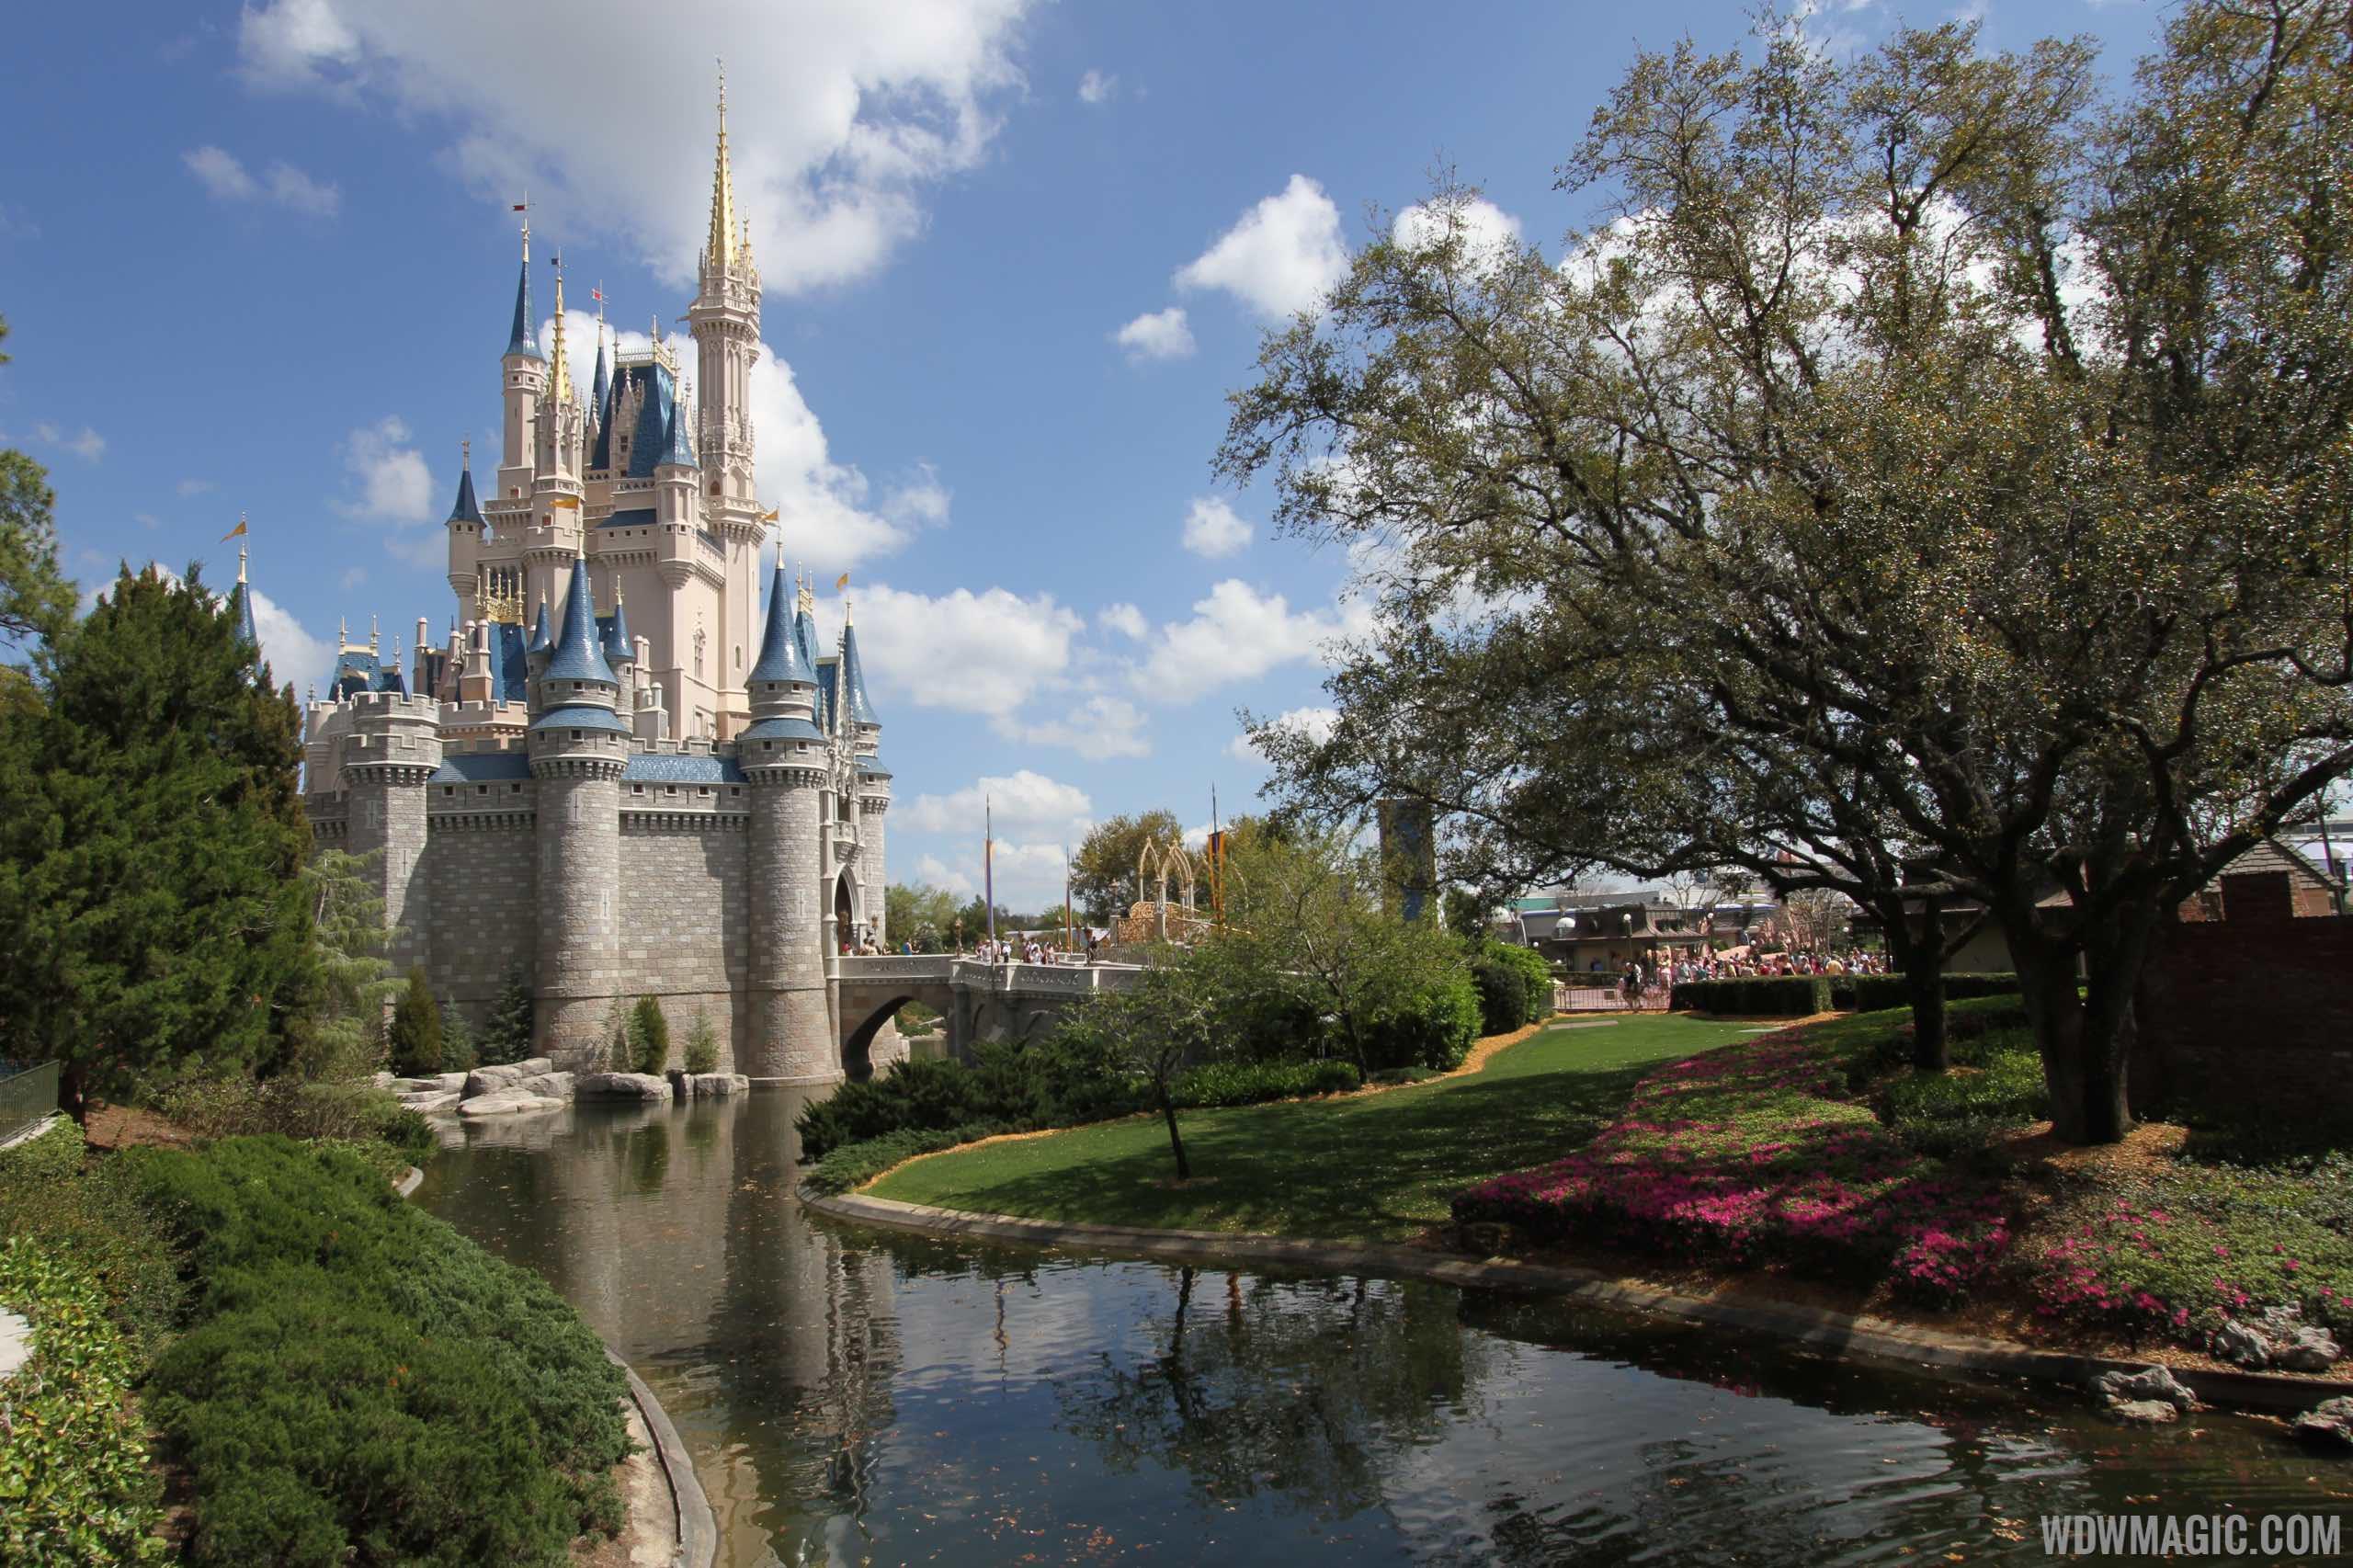 The Ultimate Disney Classics VIP Tour